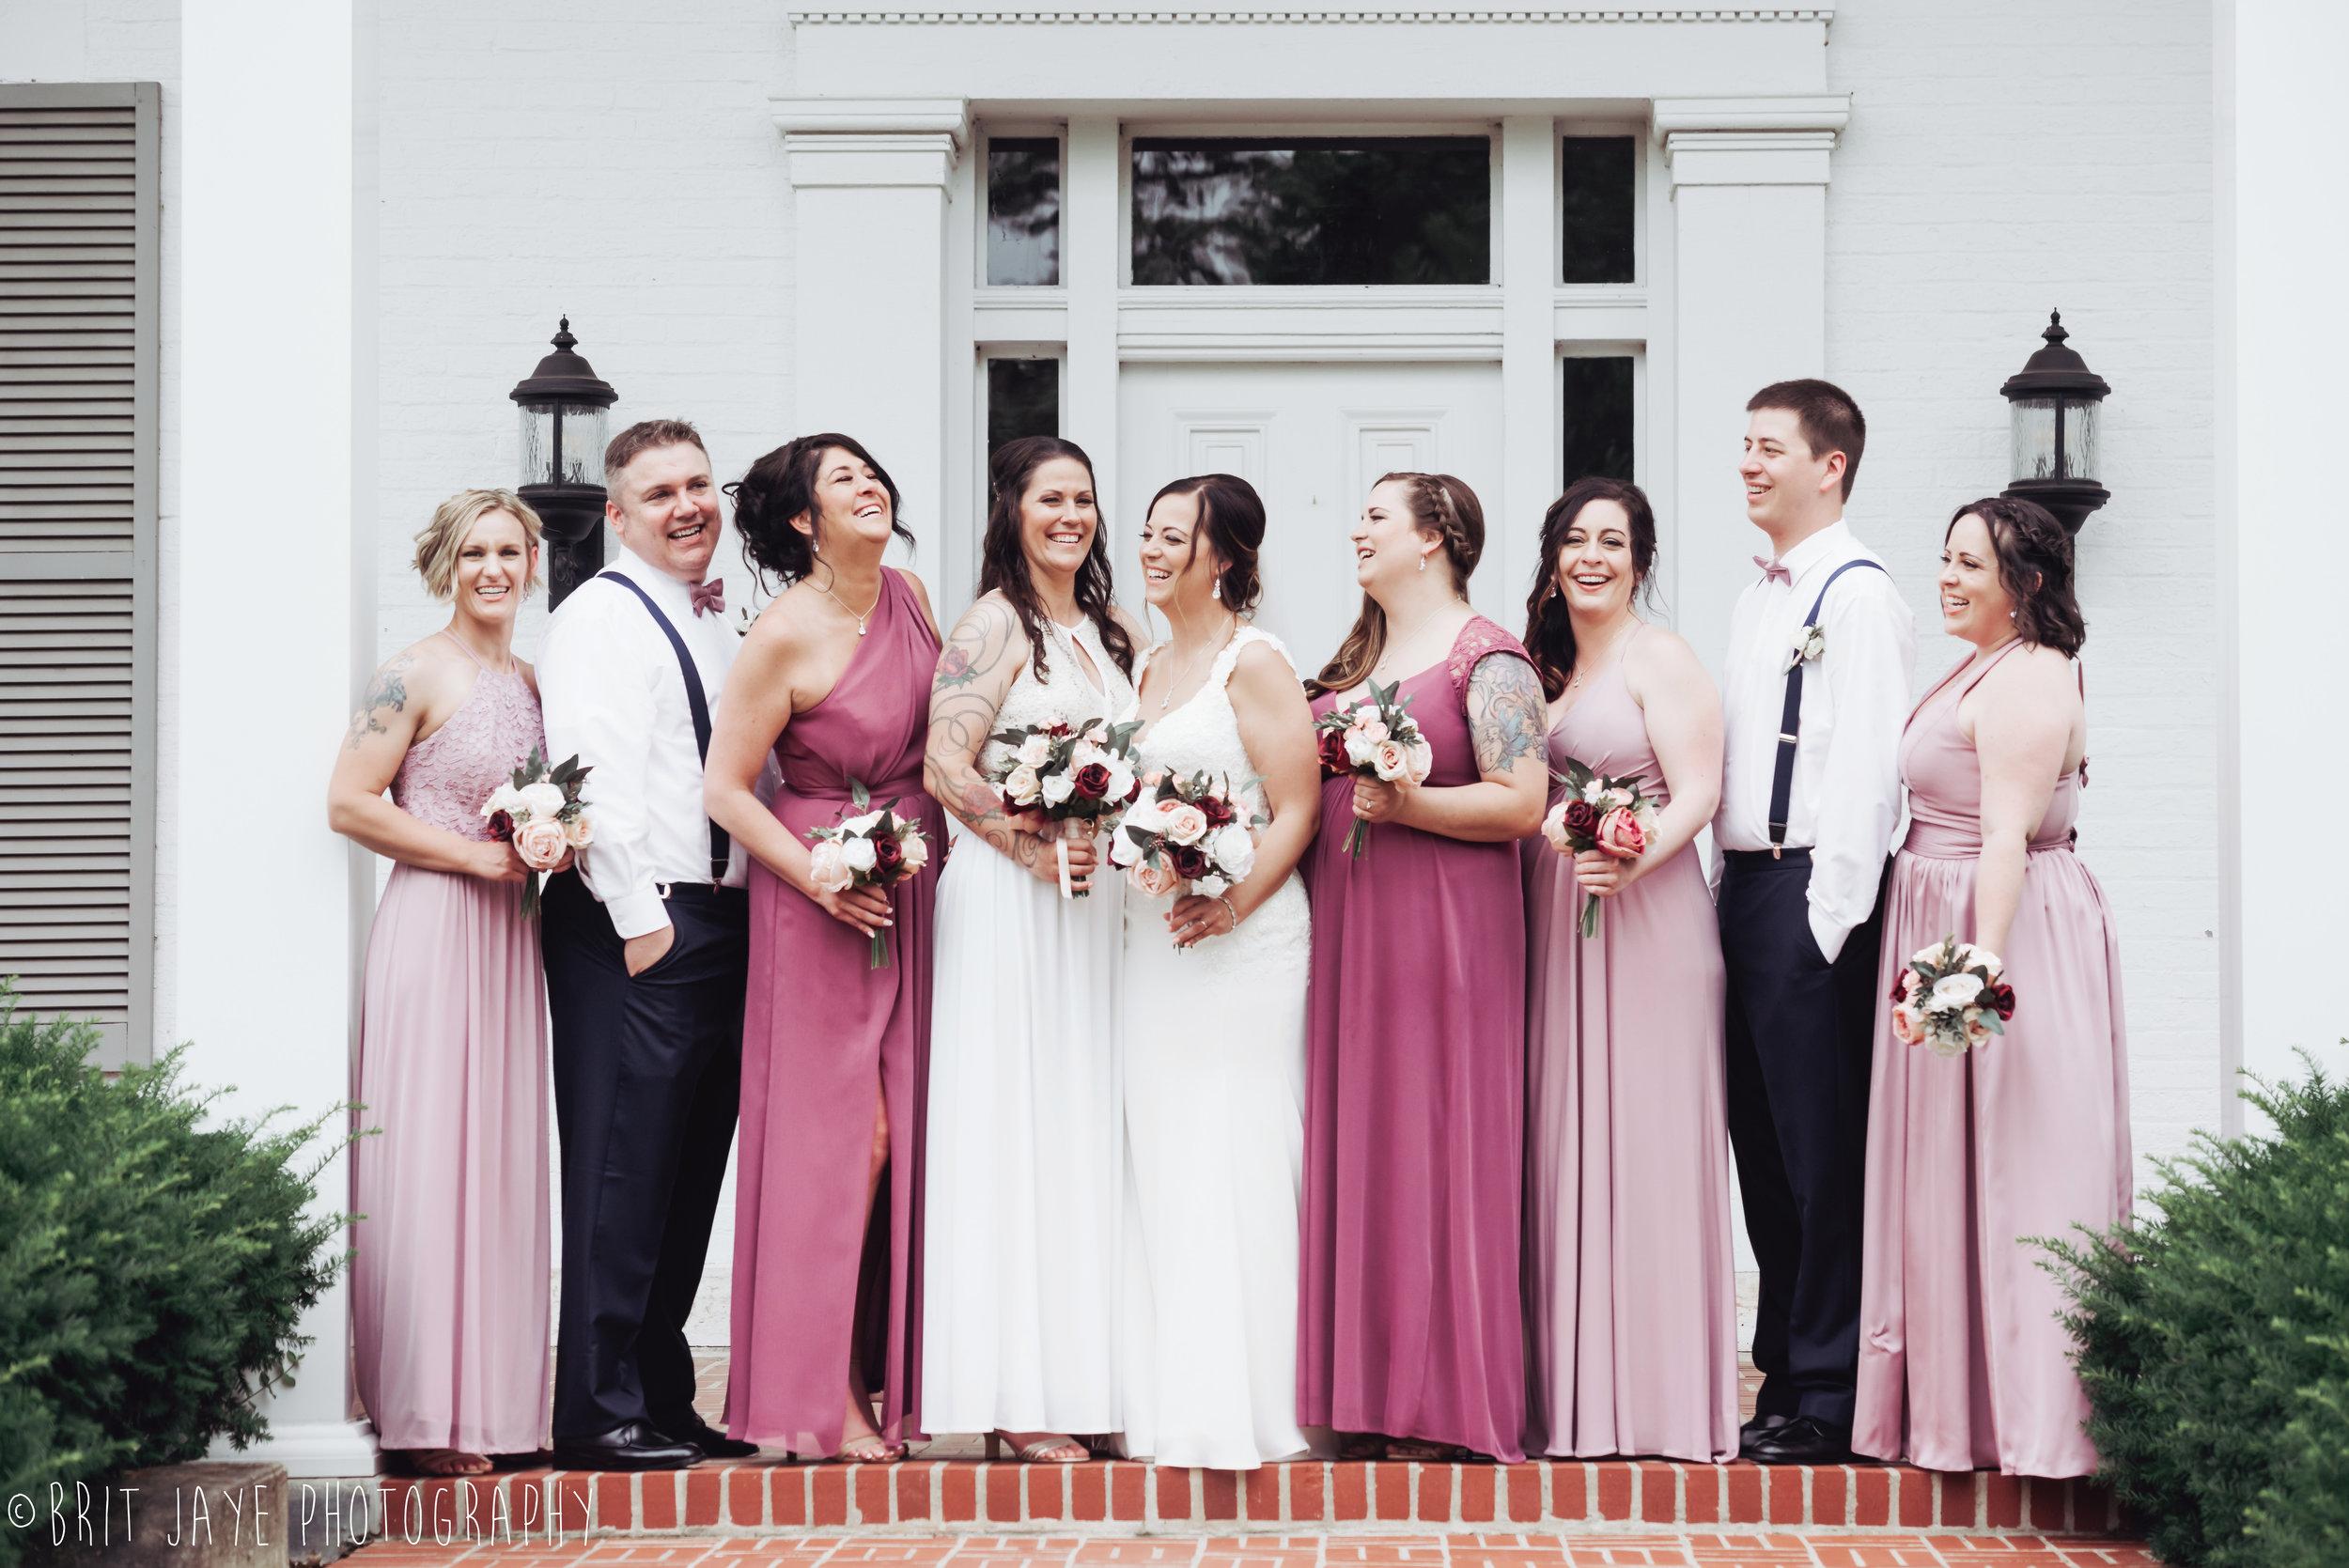 Polen_Farm_wedding_Dayton_Ohio-31.jpg